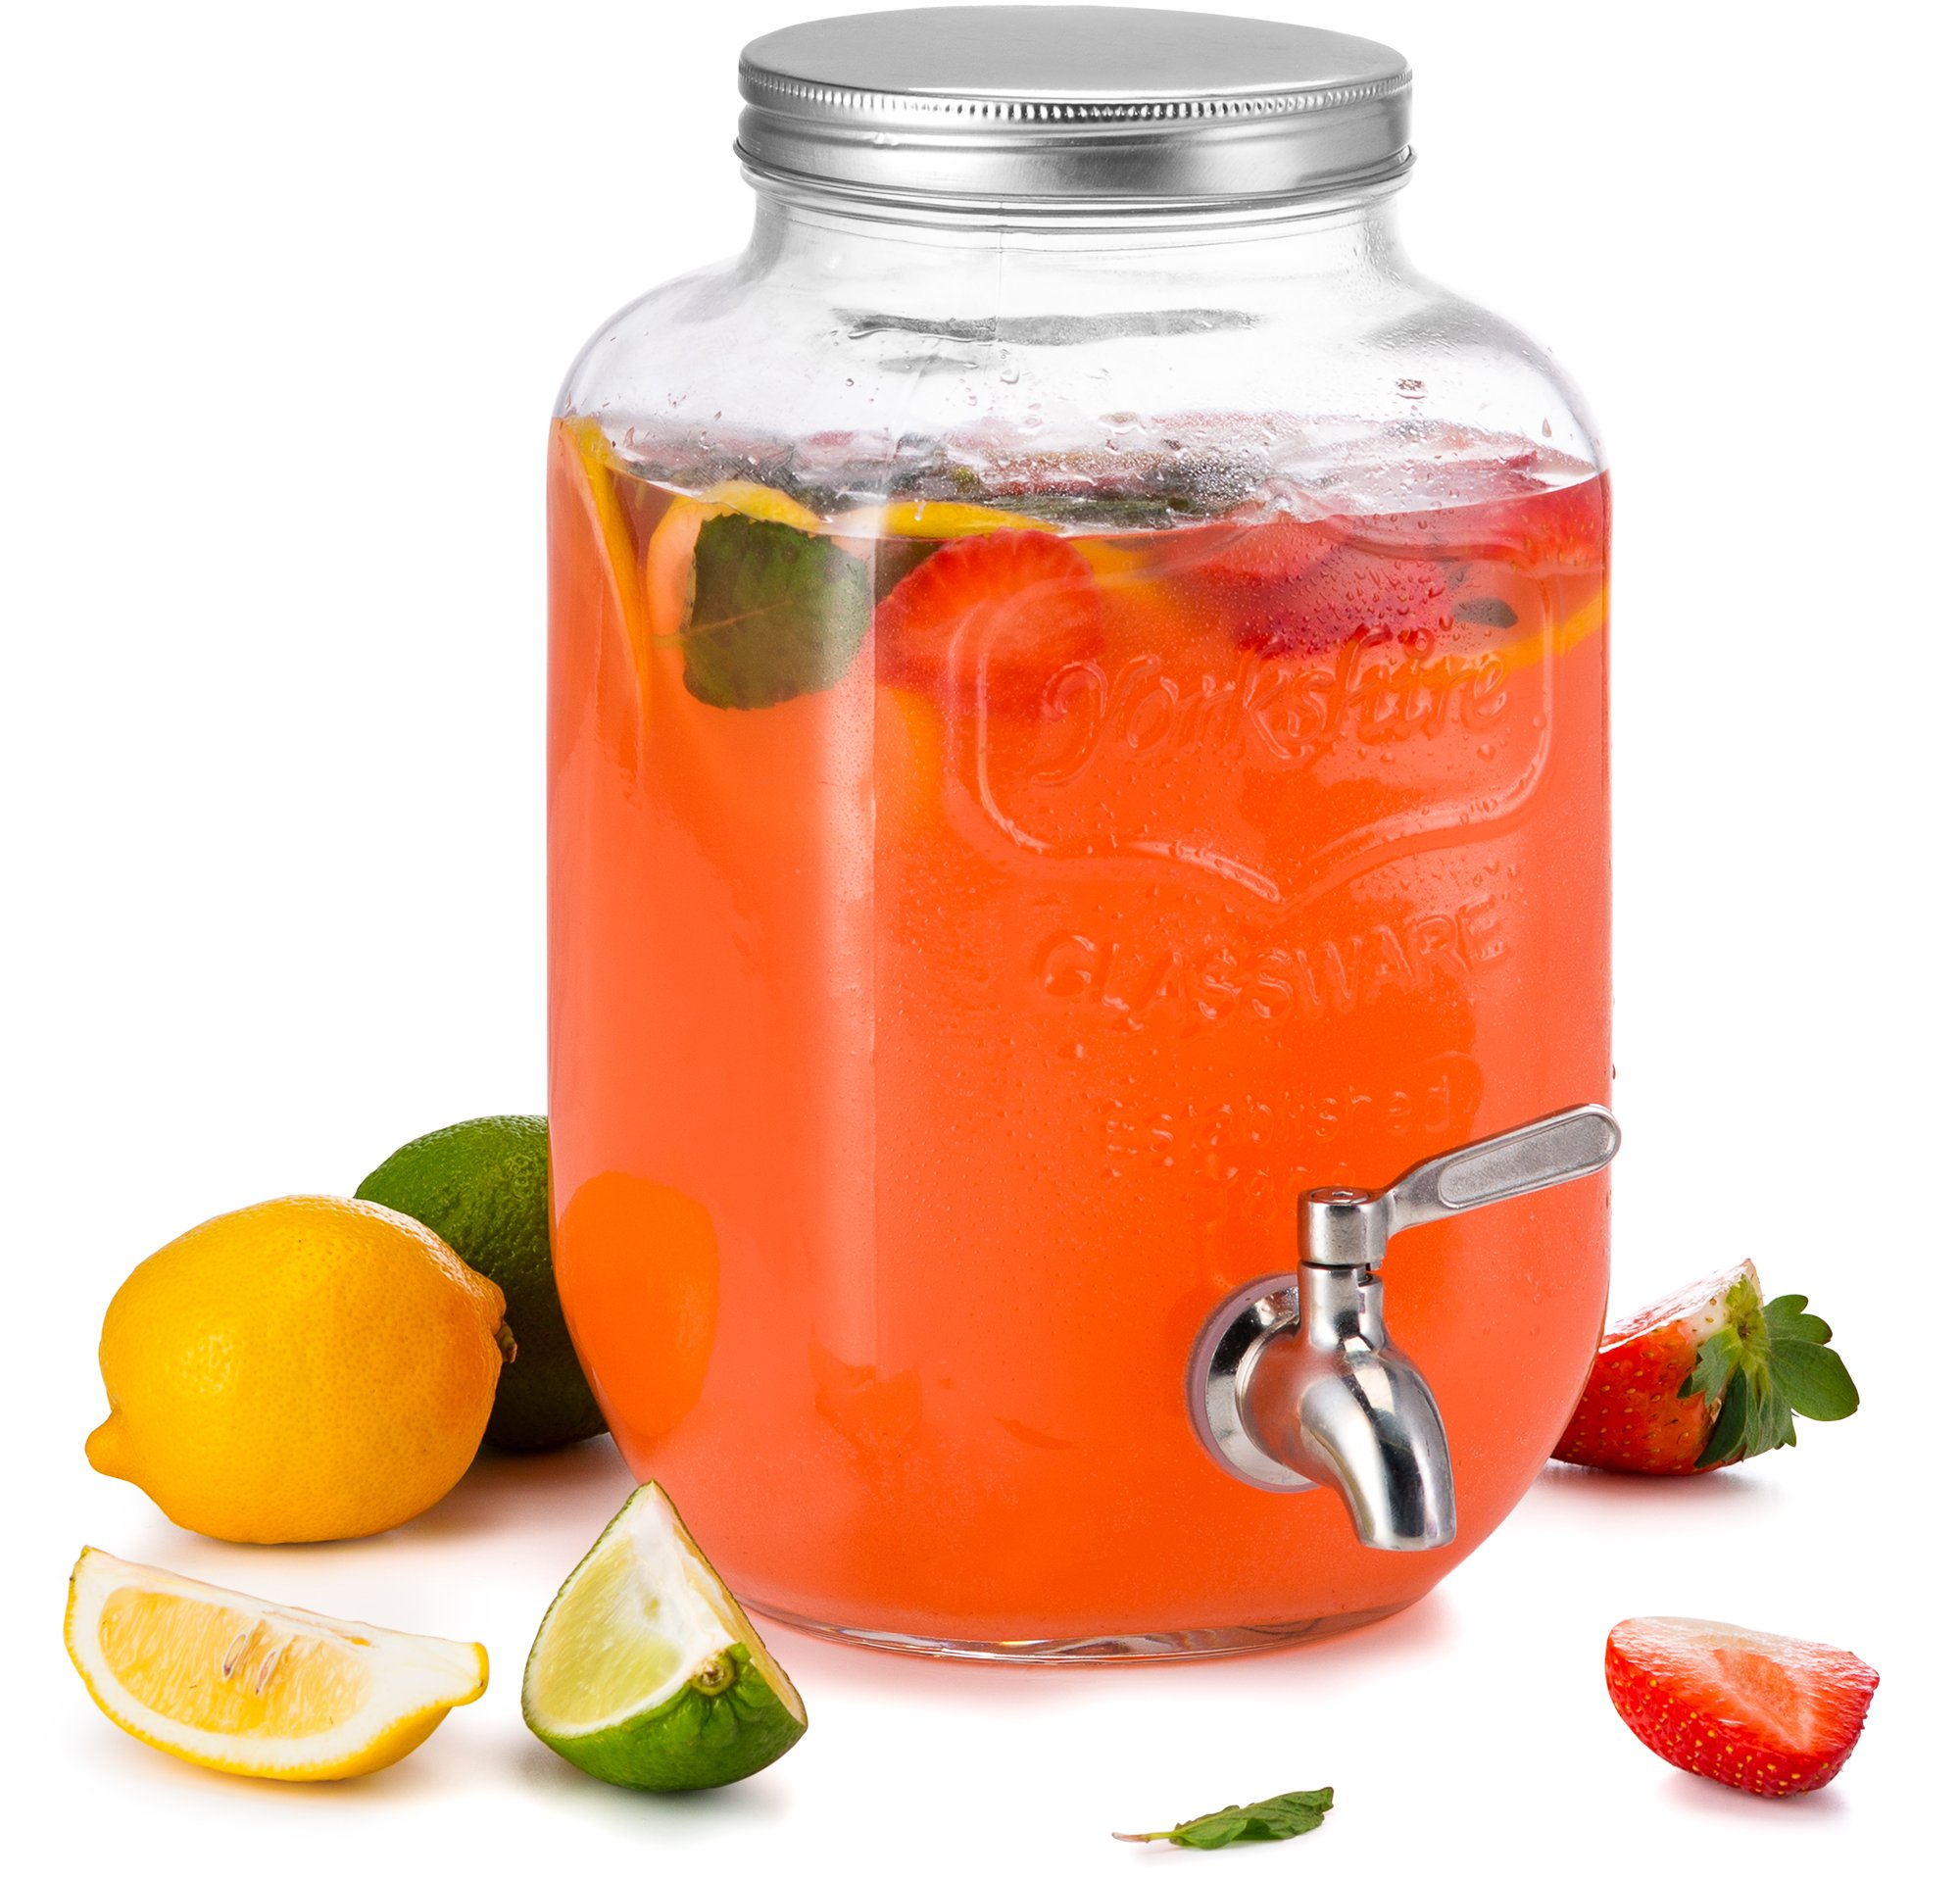 KooK Mason Jar Glass Drink & Beverage Dispenser with Stainless Steel Spigot, 1 Gallon by KooK